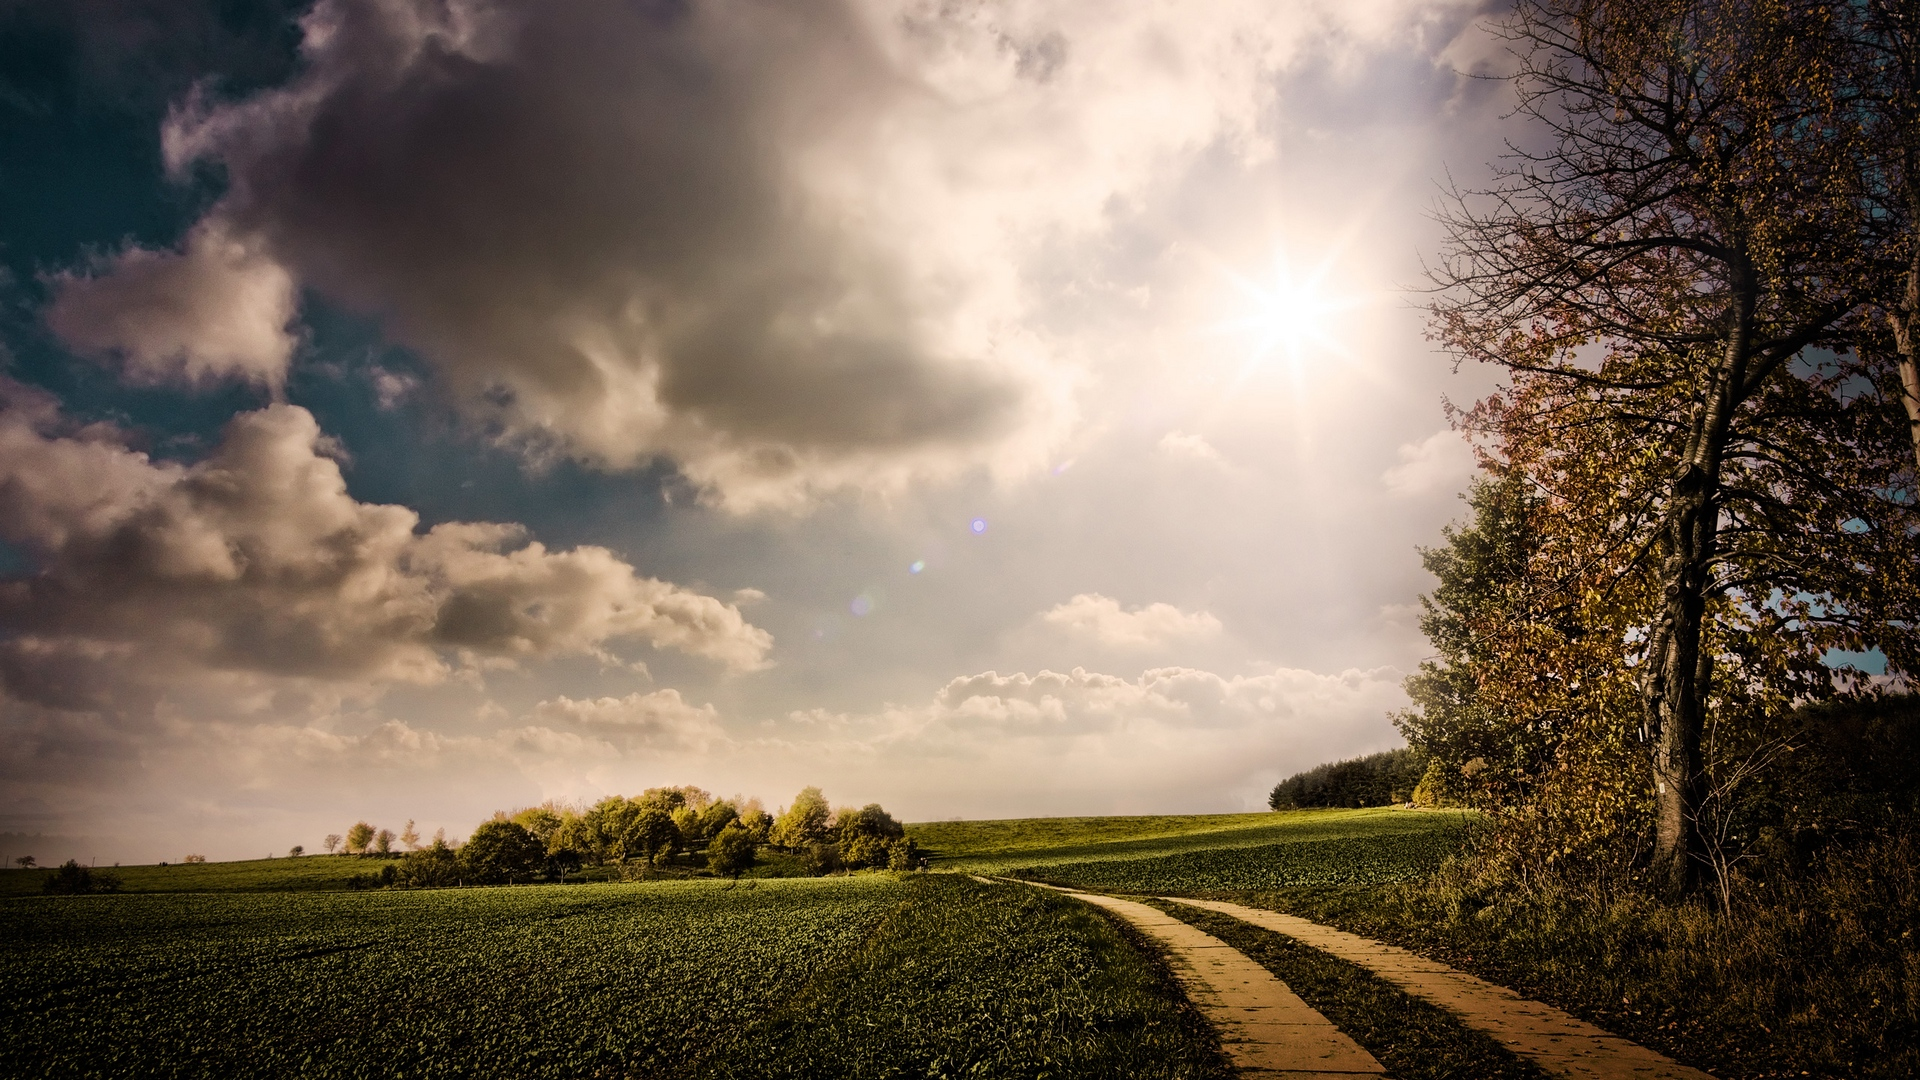 дорога, солнце, трава, деревья онлайн